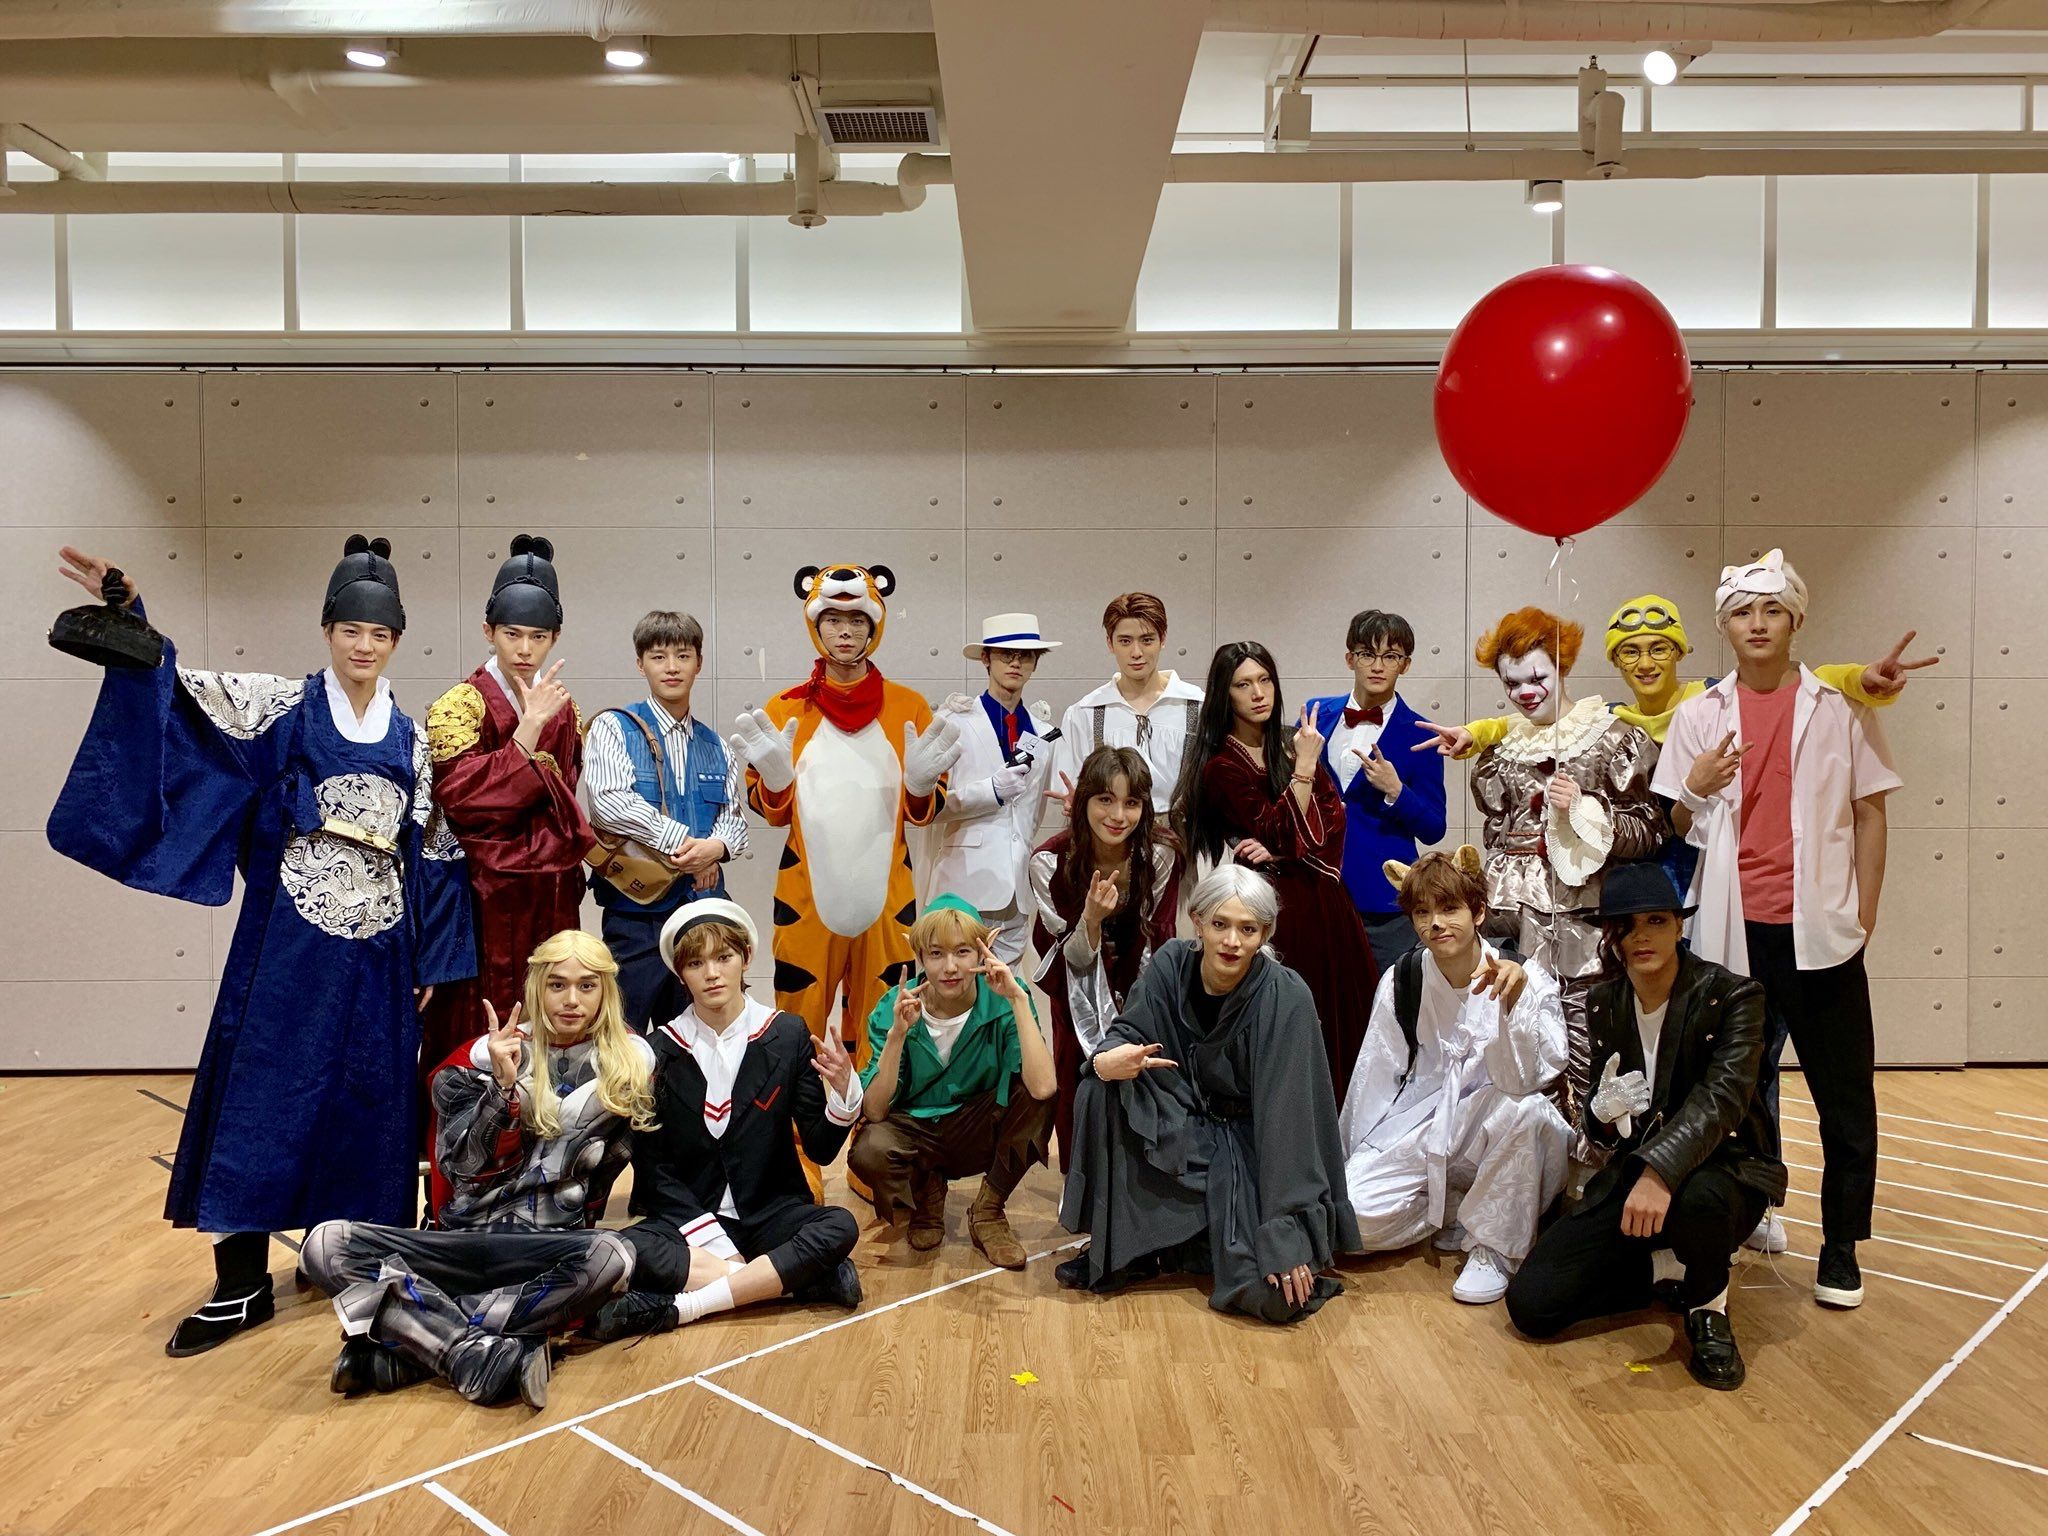 Nct 2020 Halloween 50 Gambar NCT Halloween 2018 terbaik di 2020 | nct, xiao